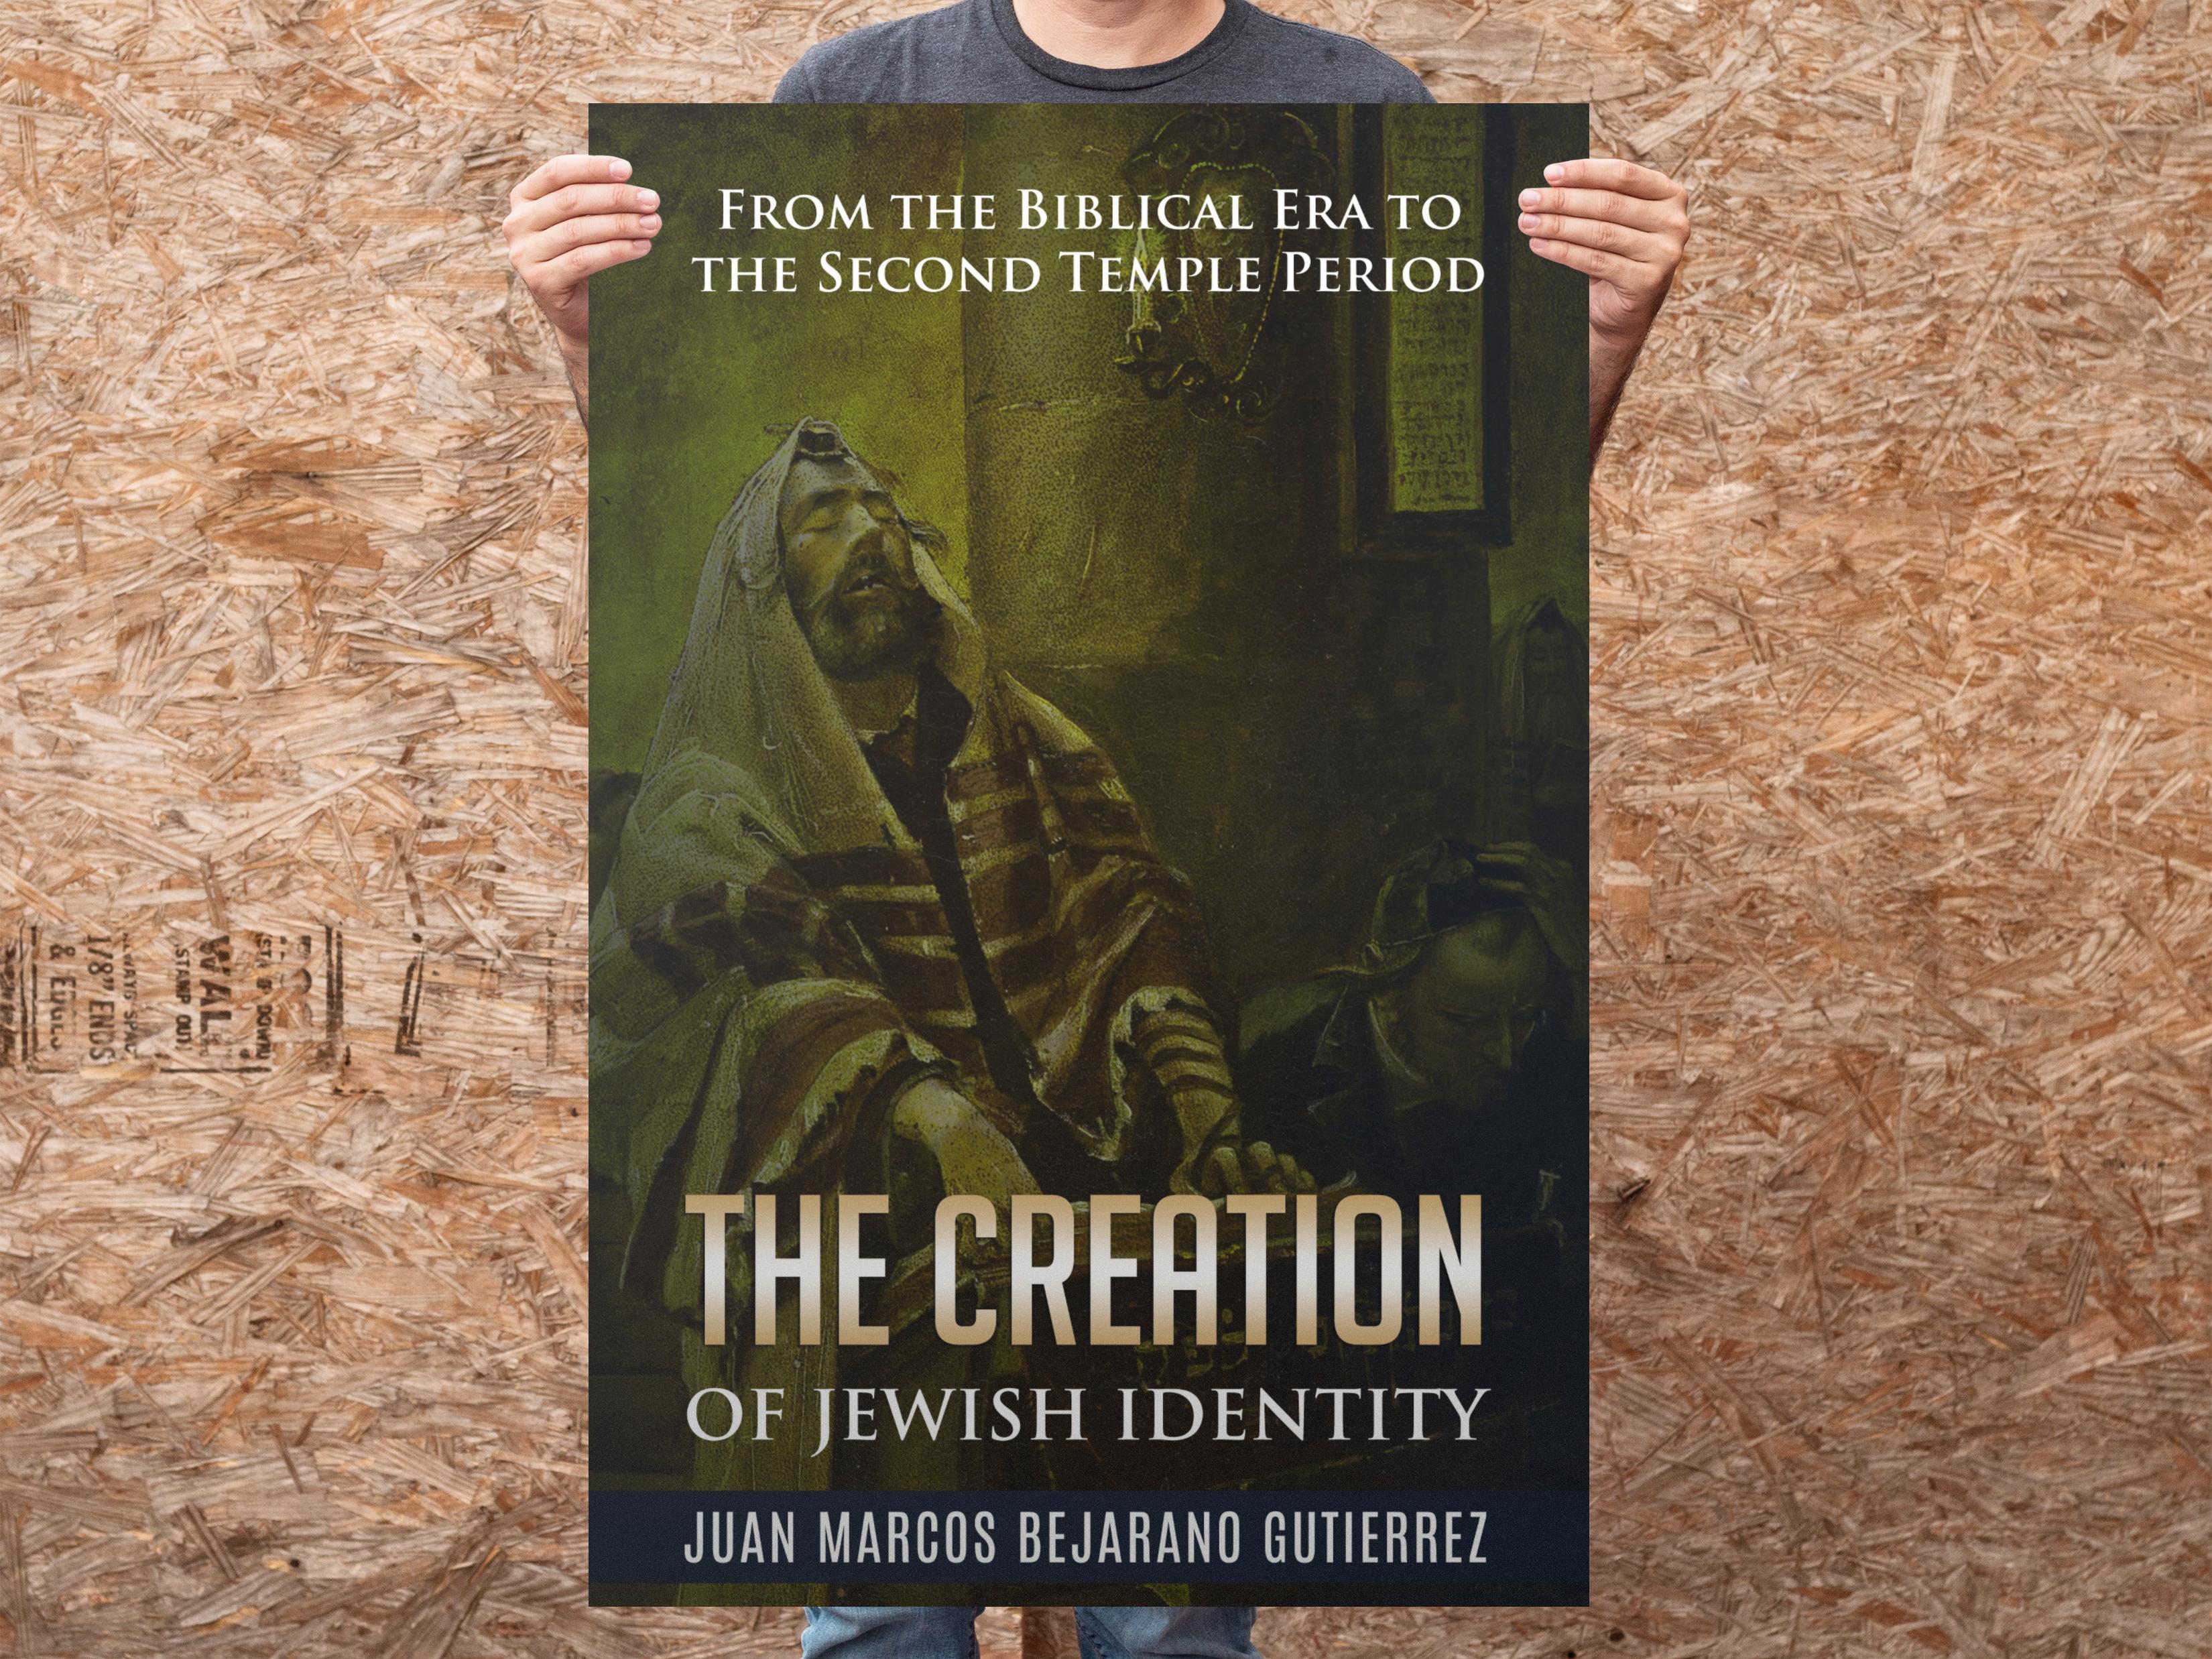 The Creation of Jewish Identity